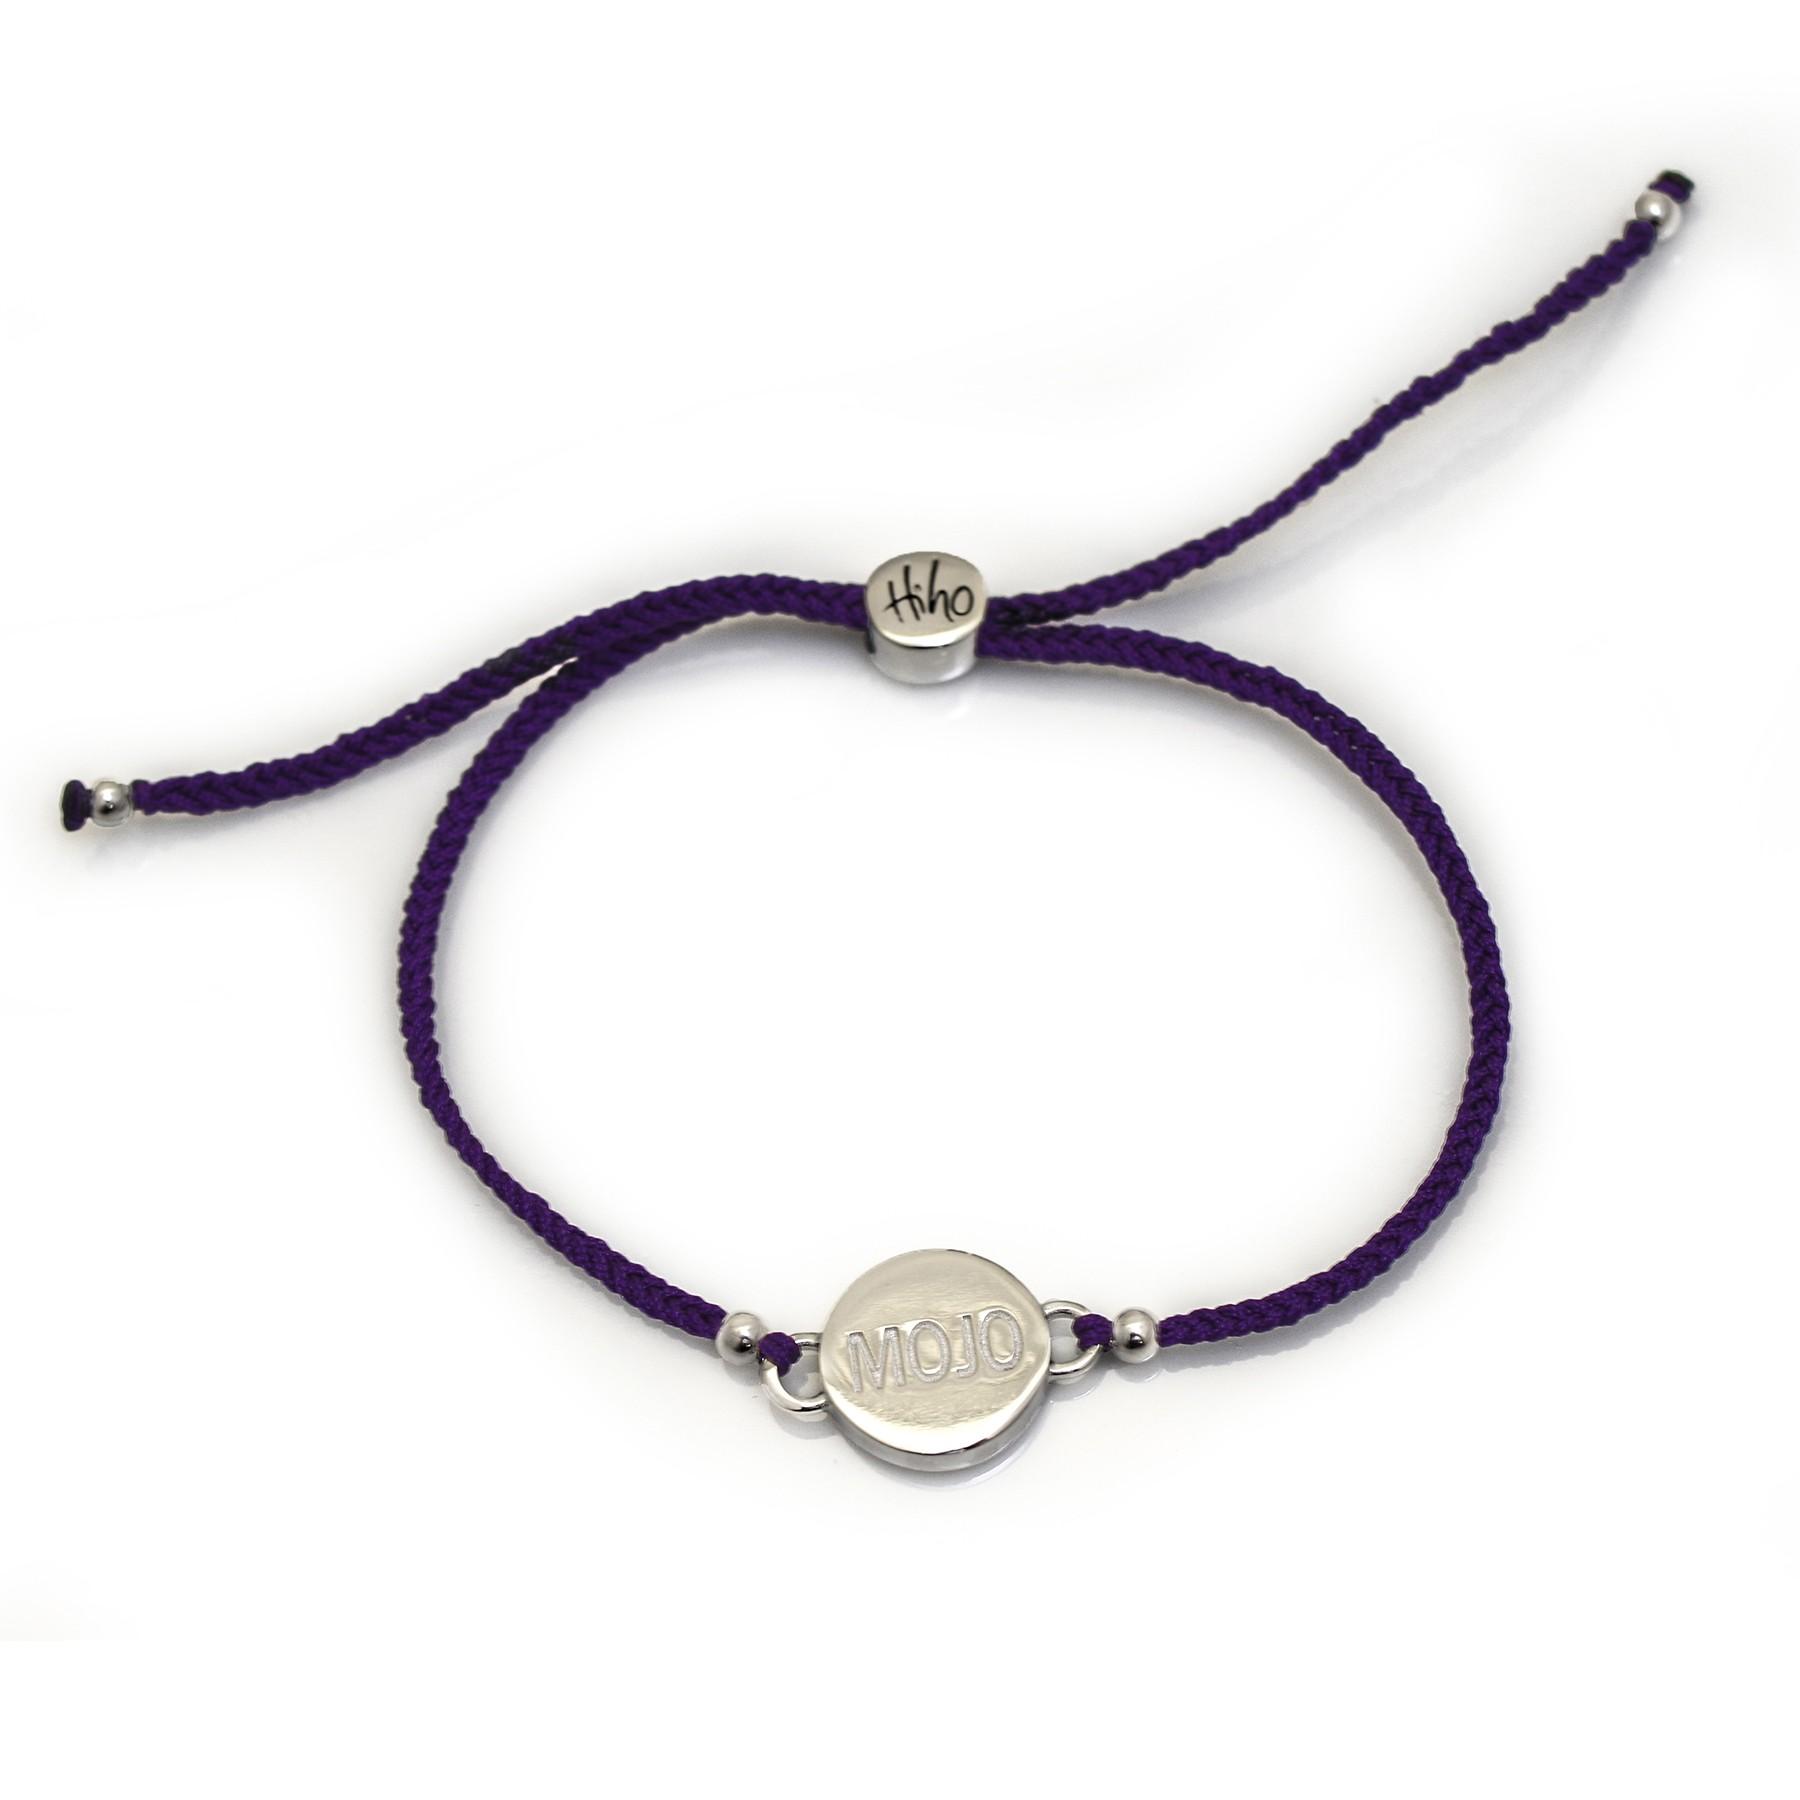 079f45344 Exclusive Sterling Silver Single Mojo Friendship Bracelet - Hiho Silver